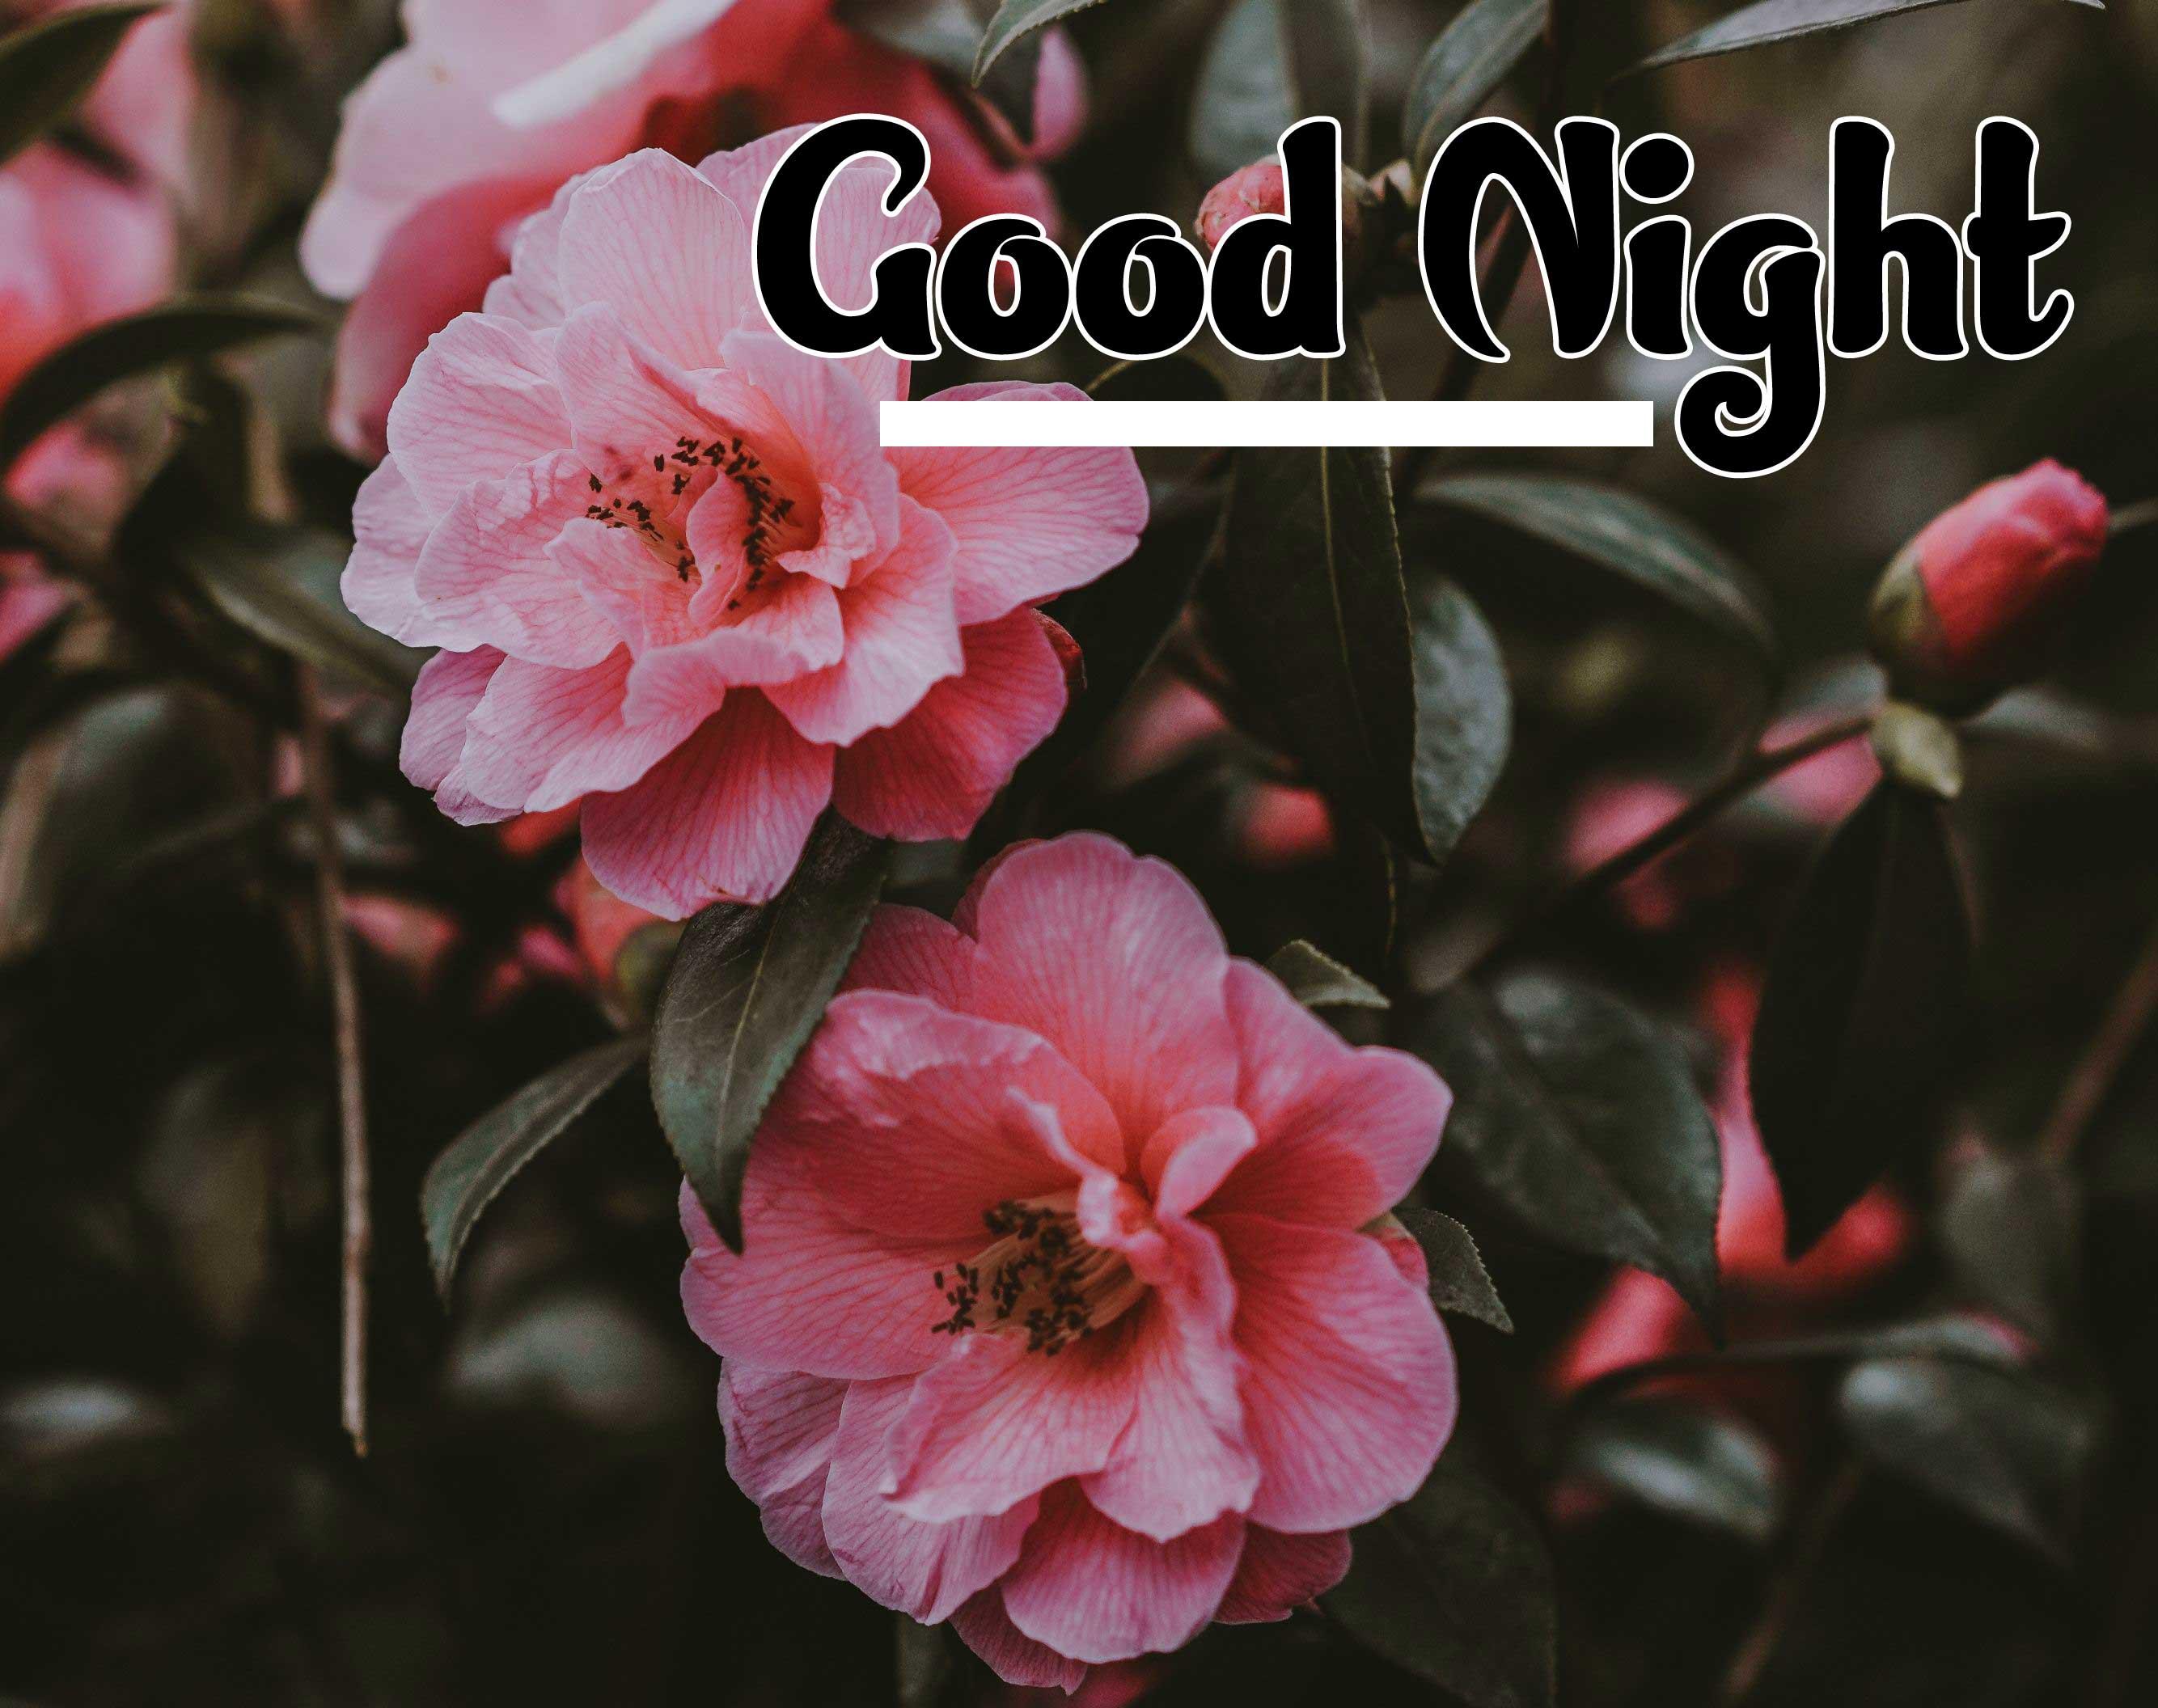 Cute Babies Good Night ImagesPics photo for Whatsapp